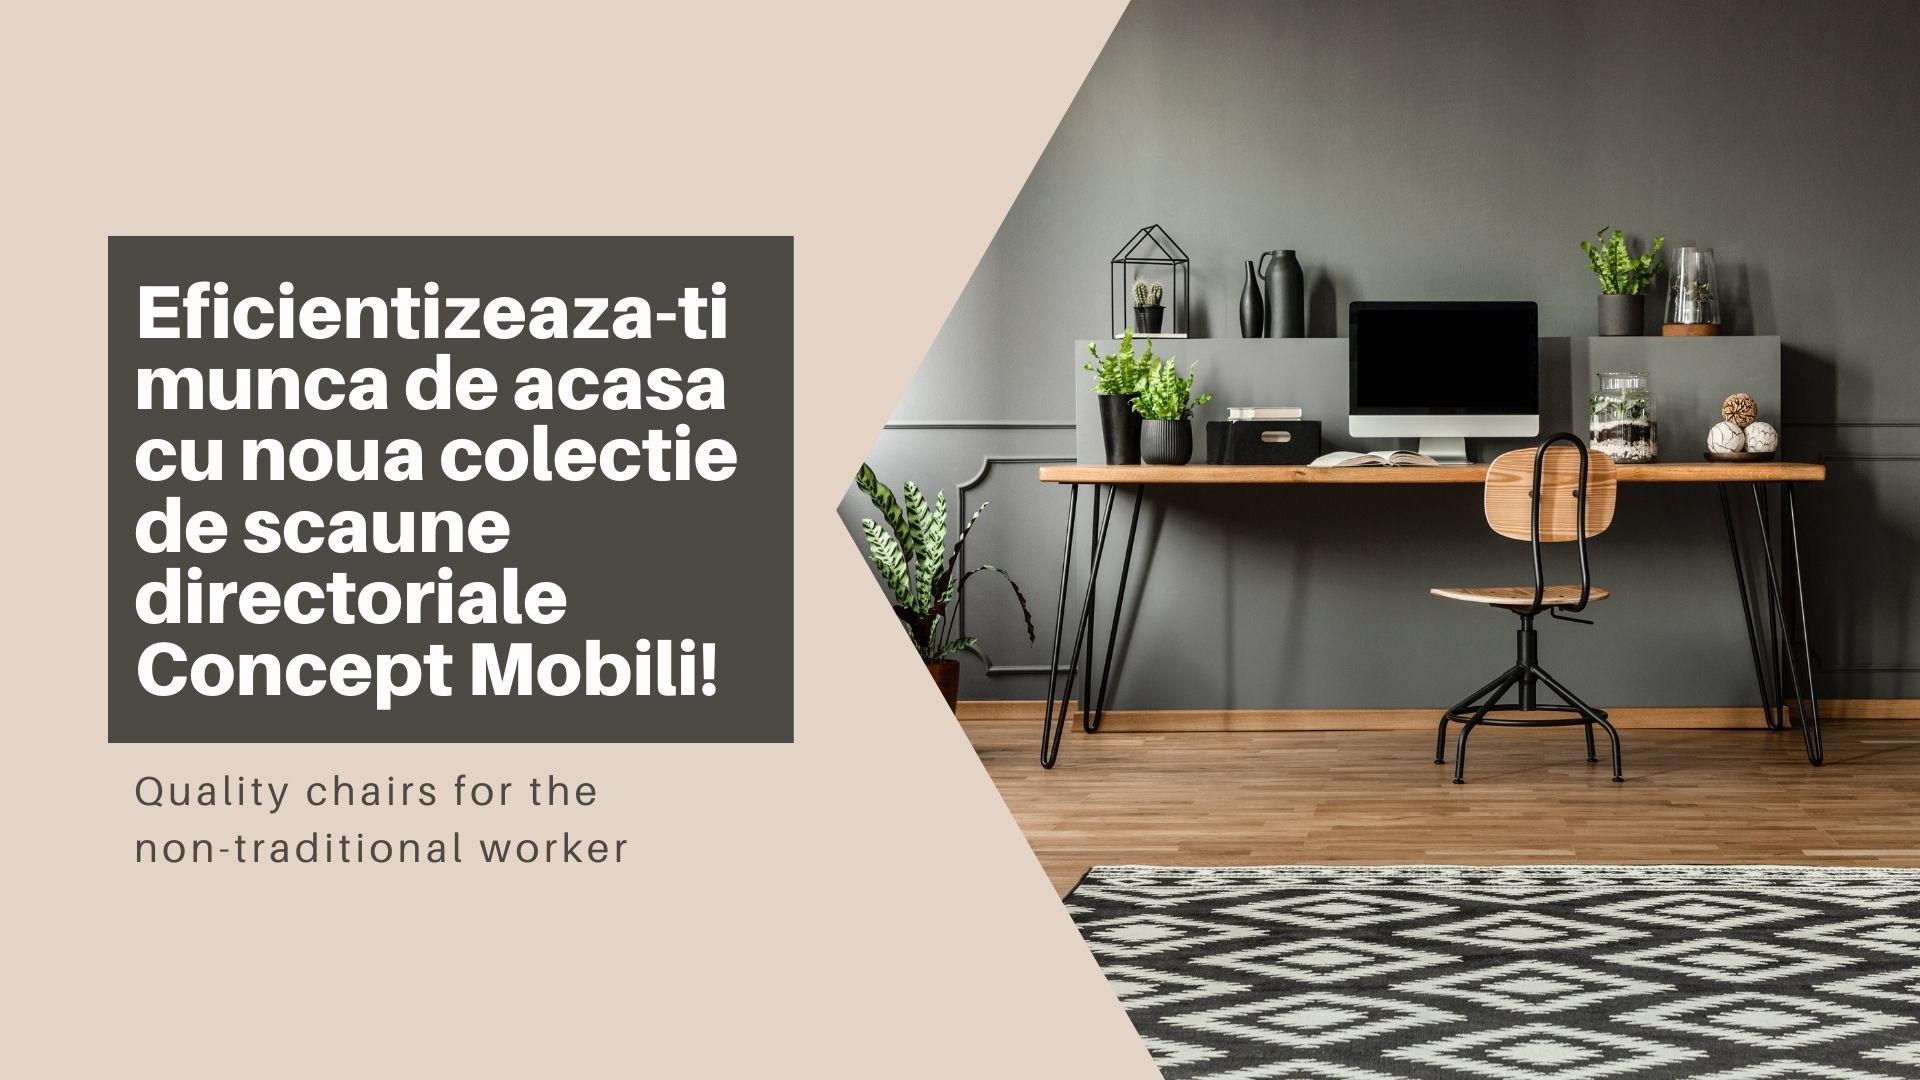 Concept Mobili